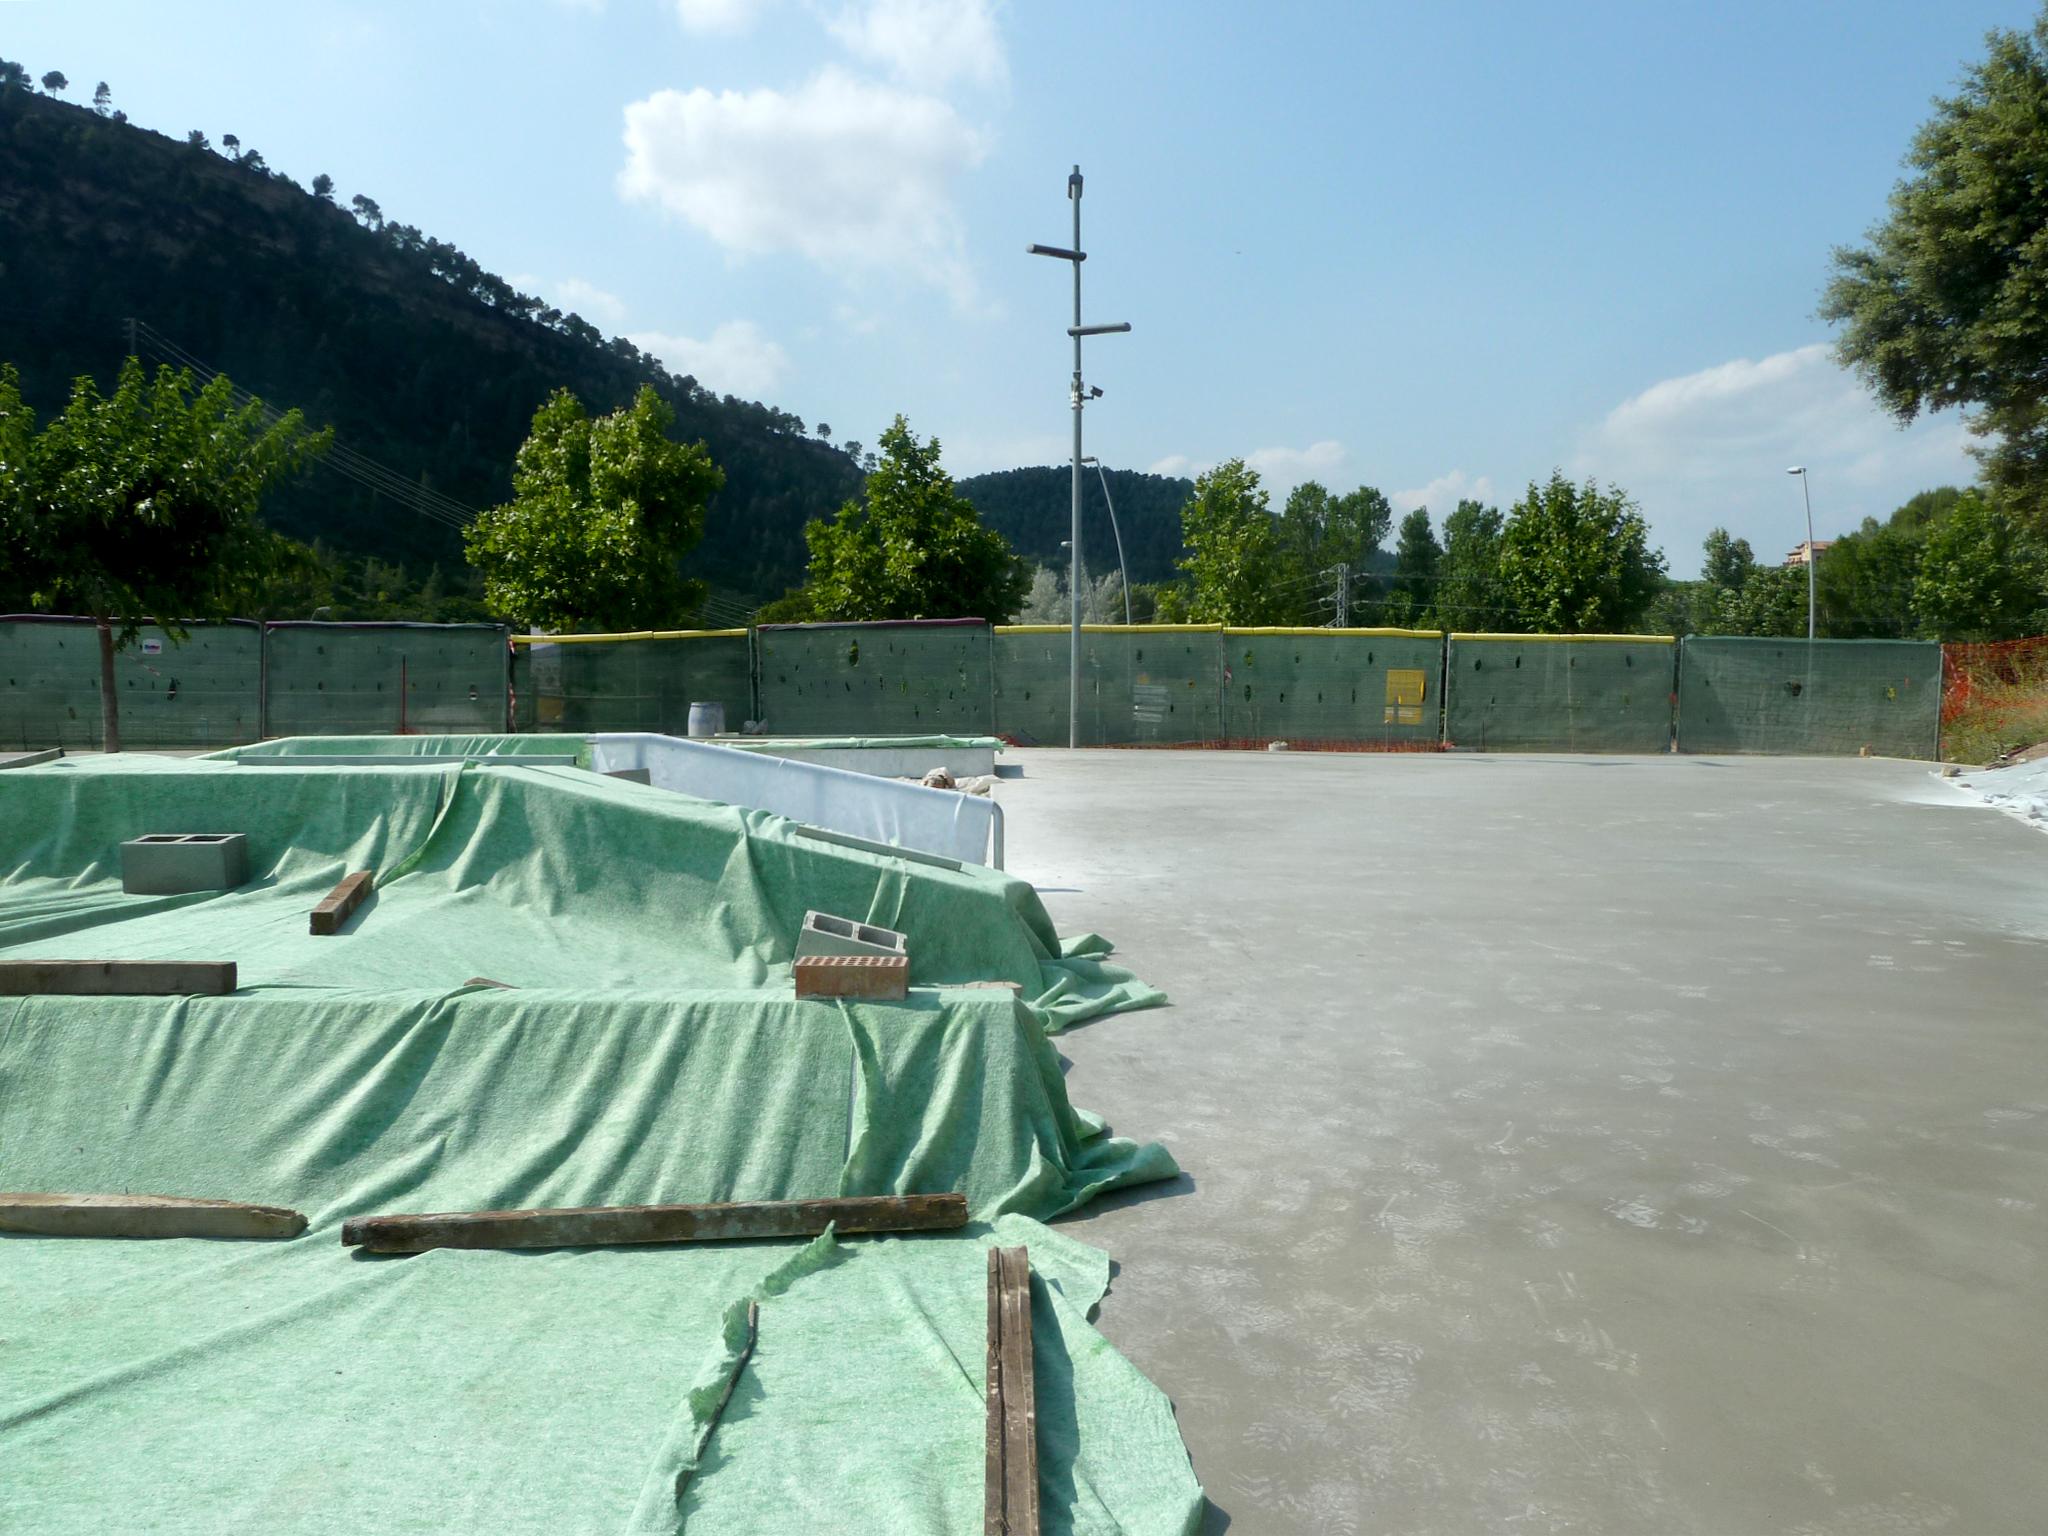 SKATE-ARCHITECTS-EL-PONT-DE-VILOMARA-P1150015.jpg